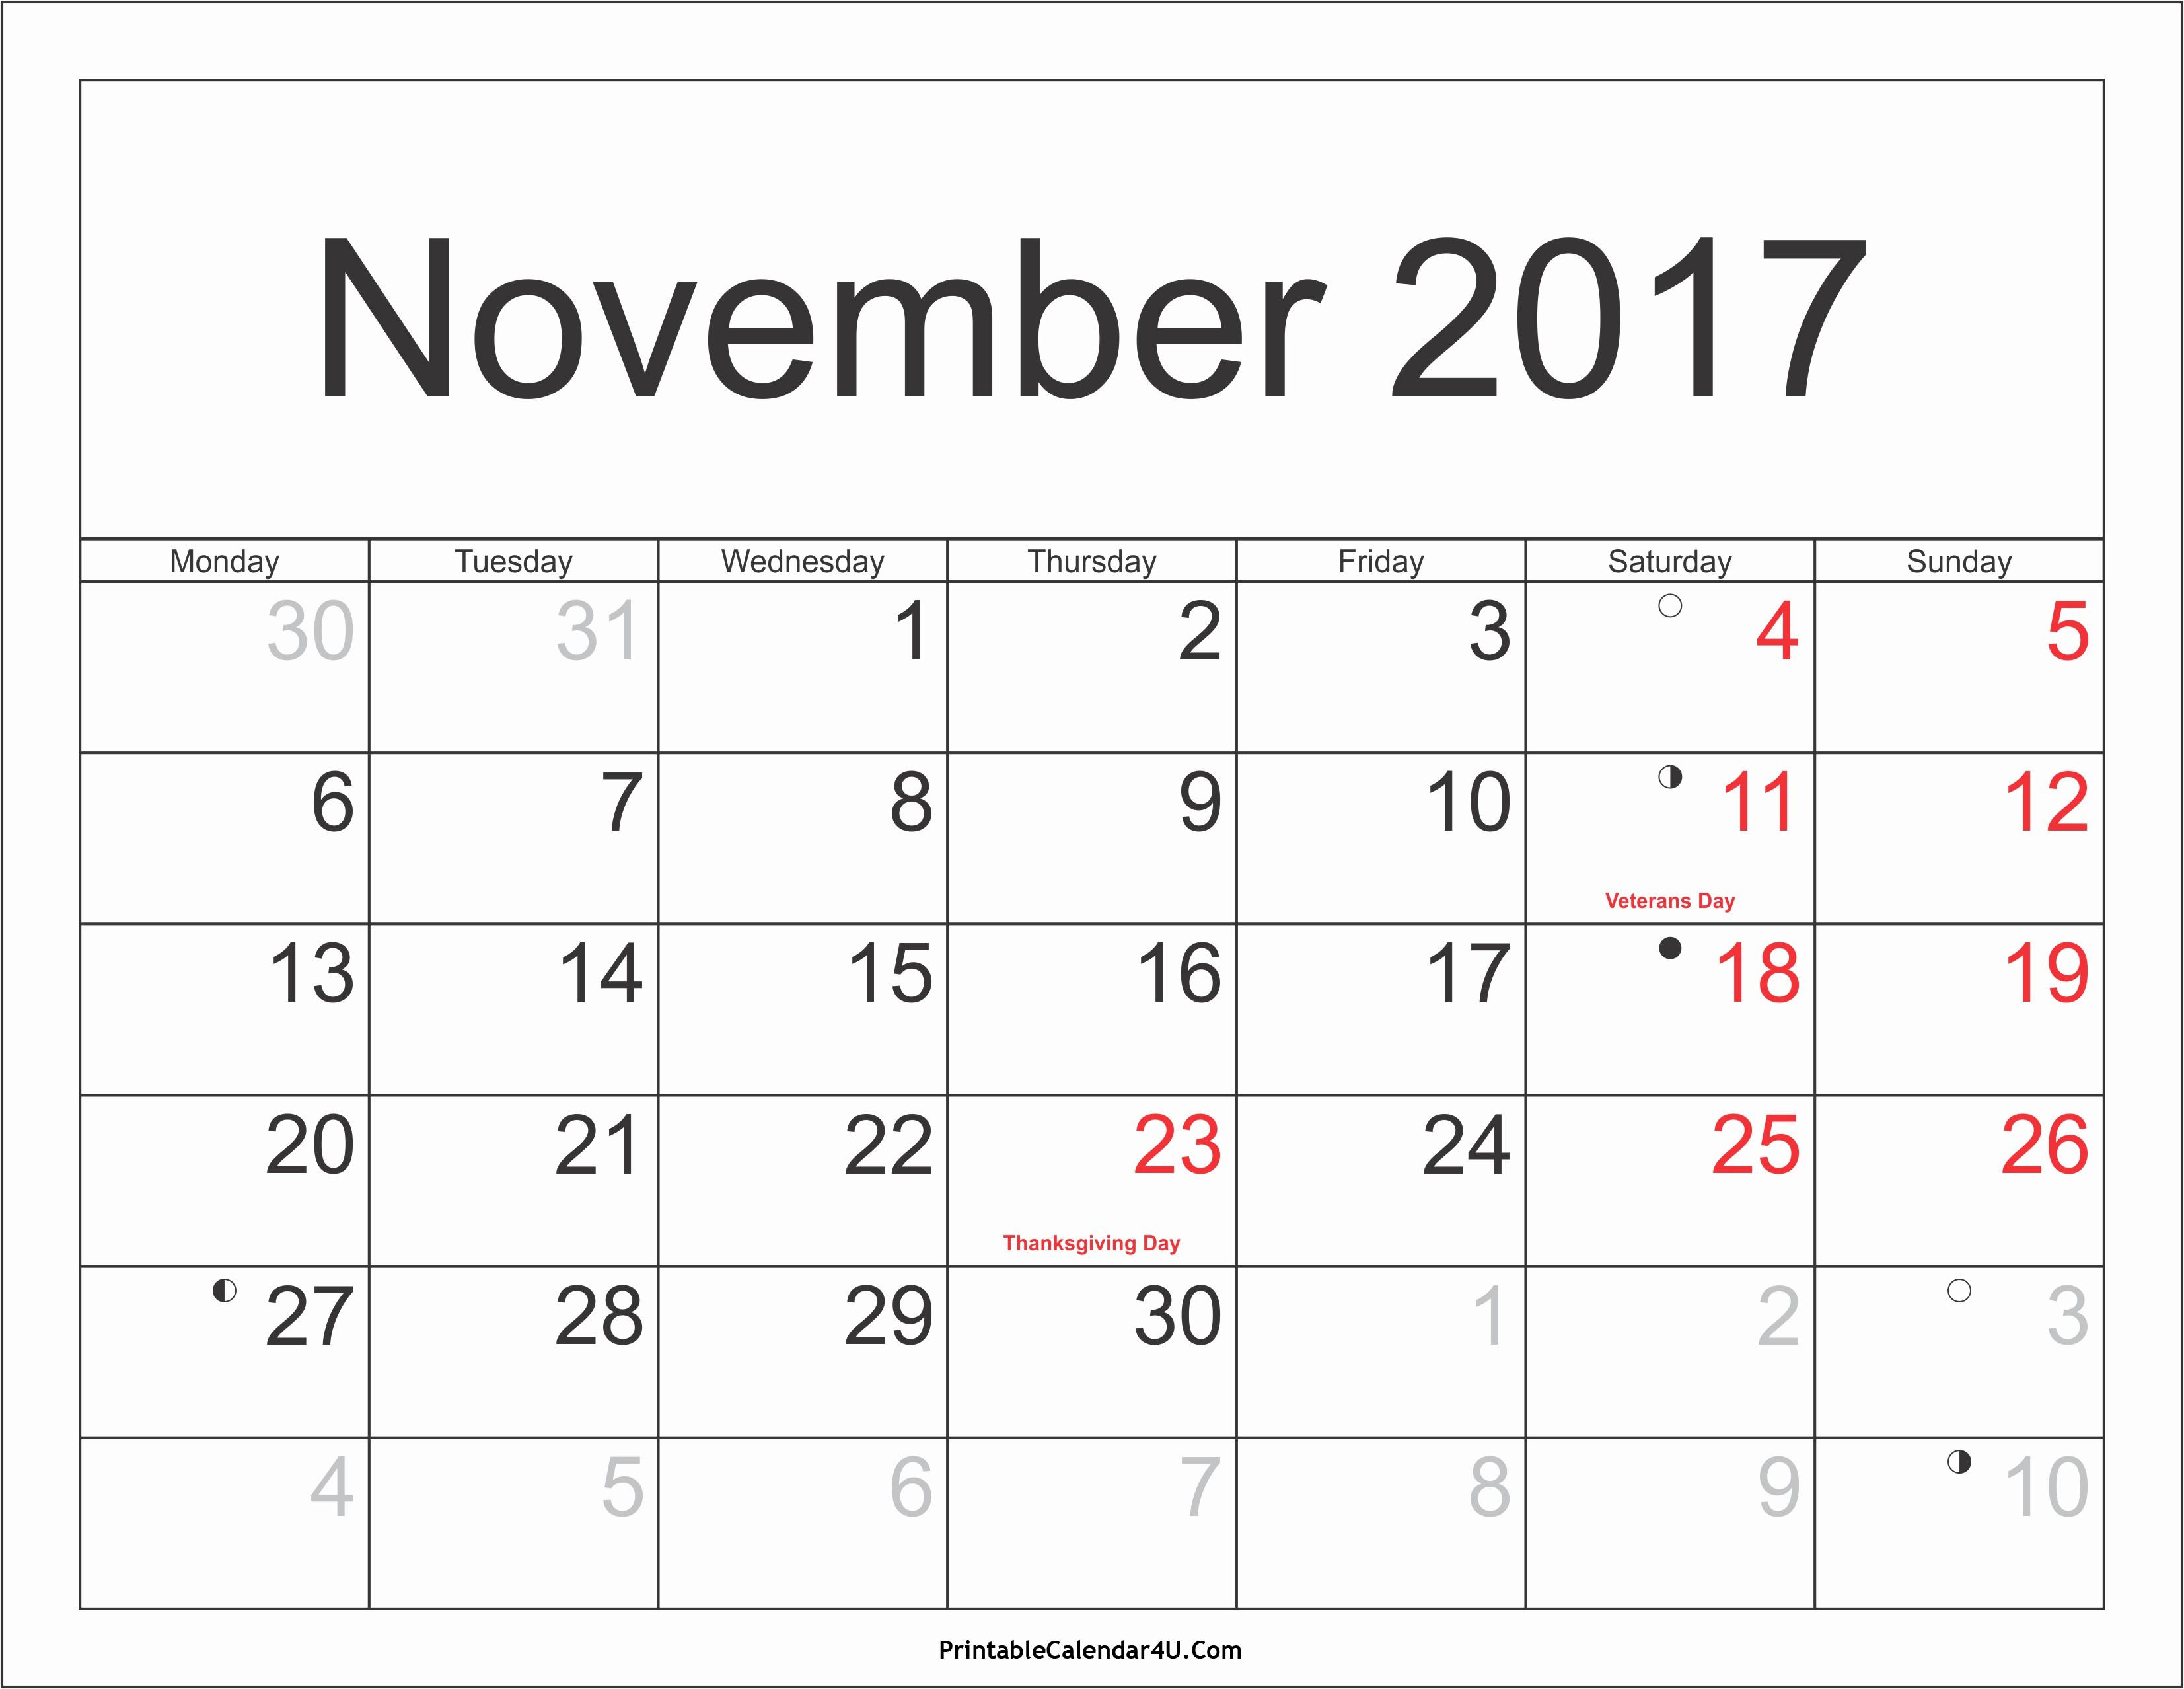 Blank November 2017 Calendar Template Elegant November 2017 Calendar with Holidays